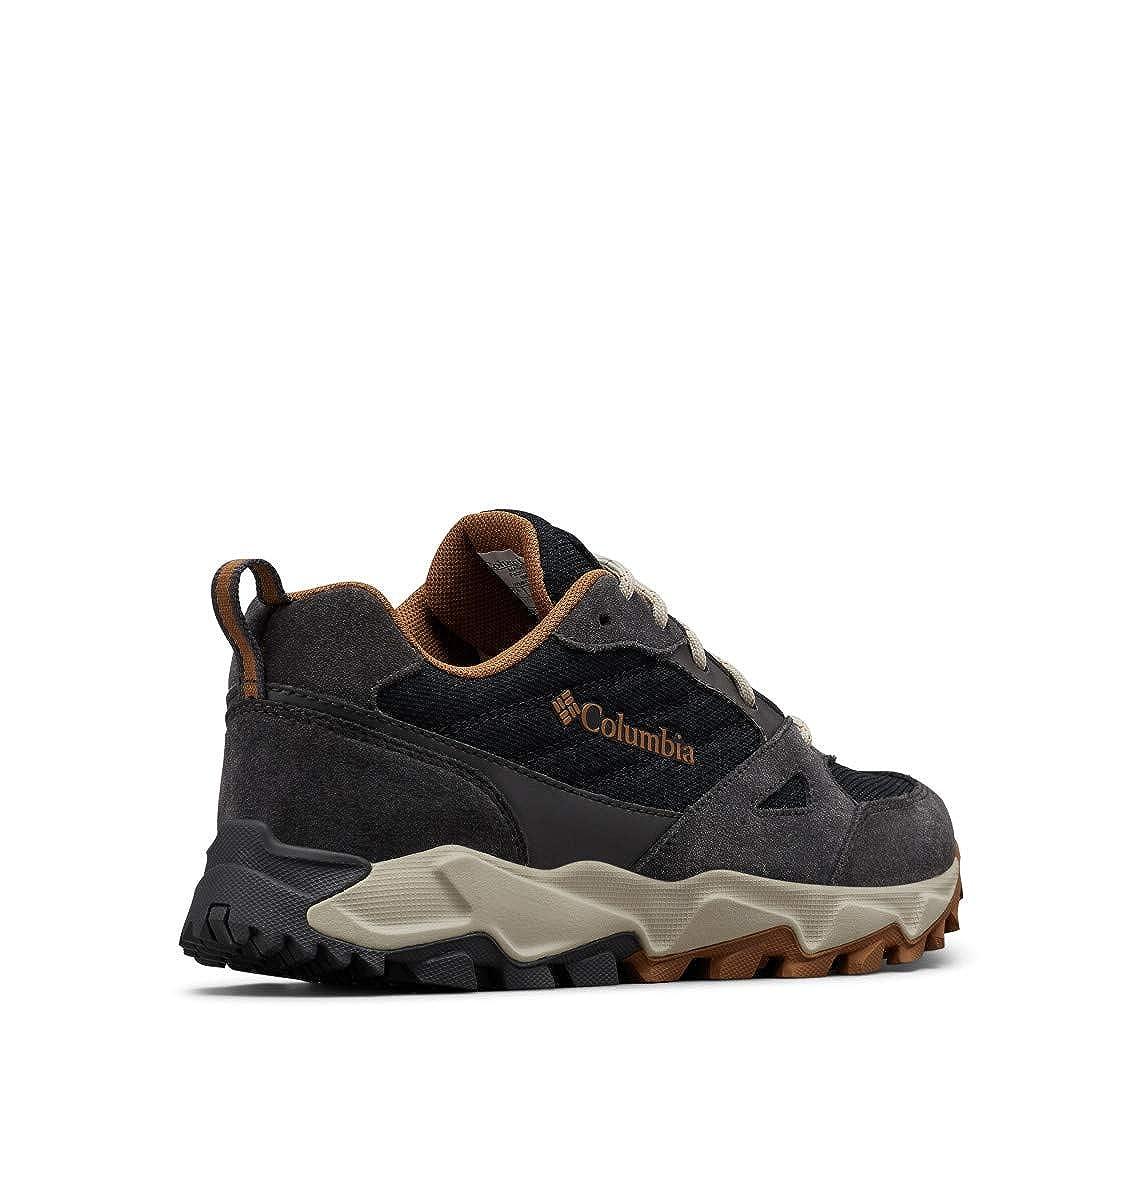 Zapatillas de Senderismo Mujer Columbia Ivo Trail